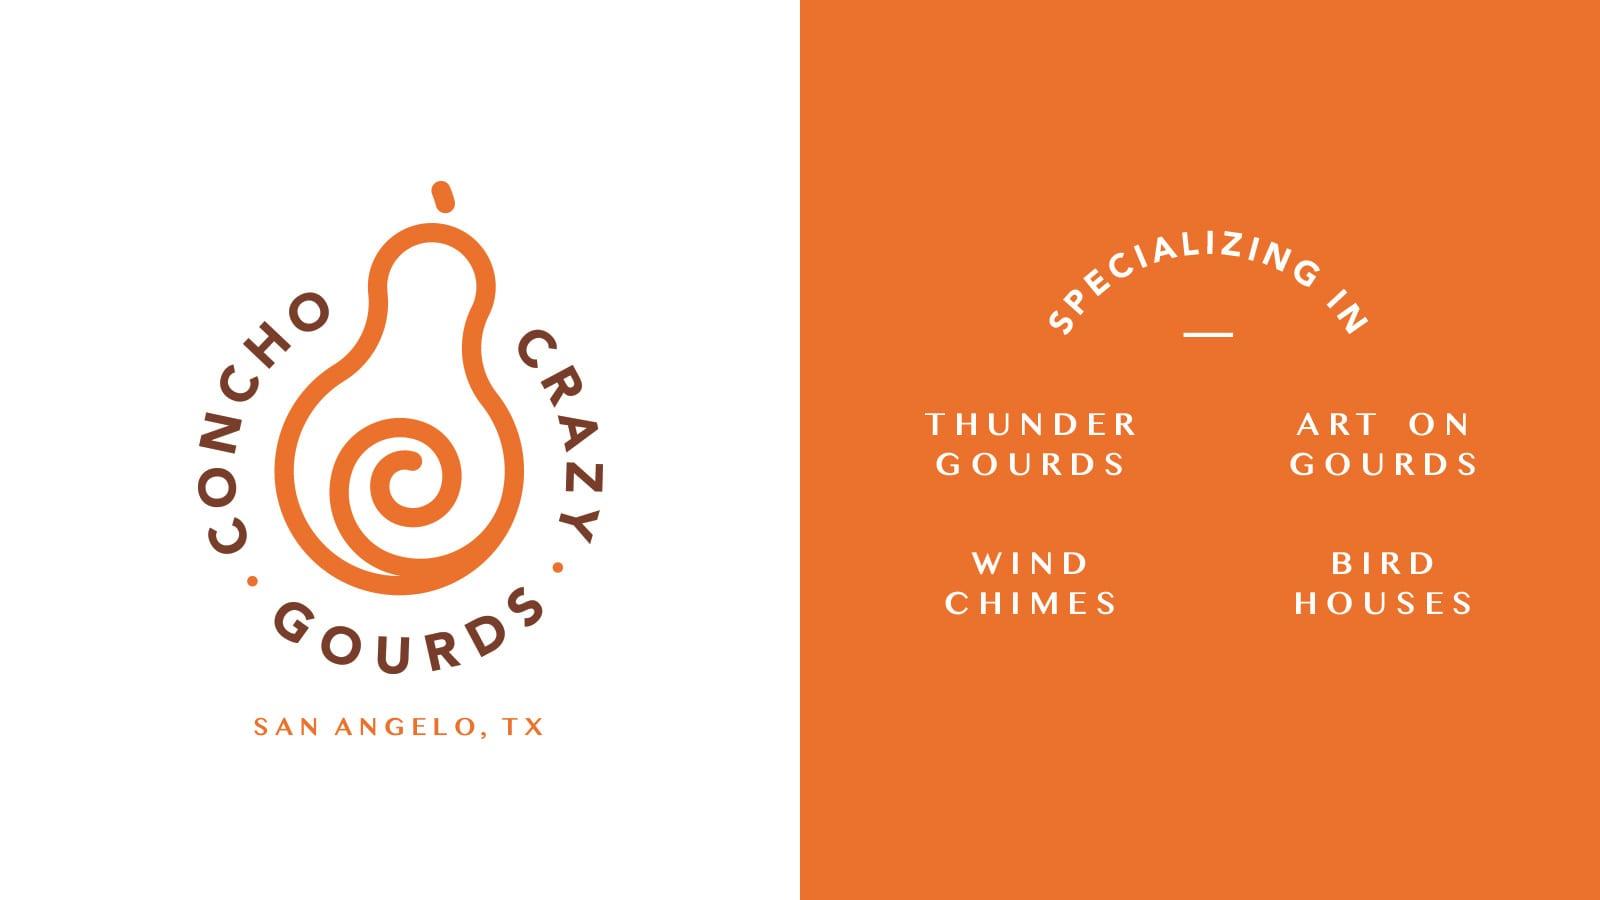 Logos_ConchoCrazyGourds